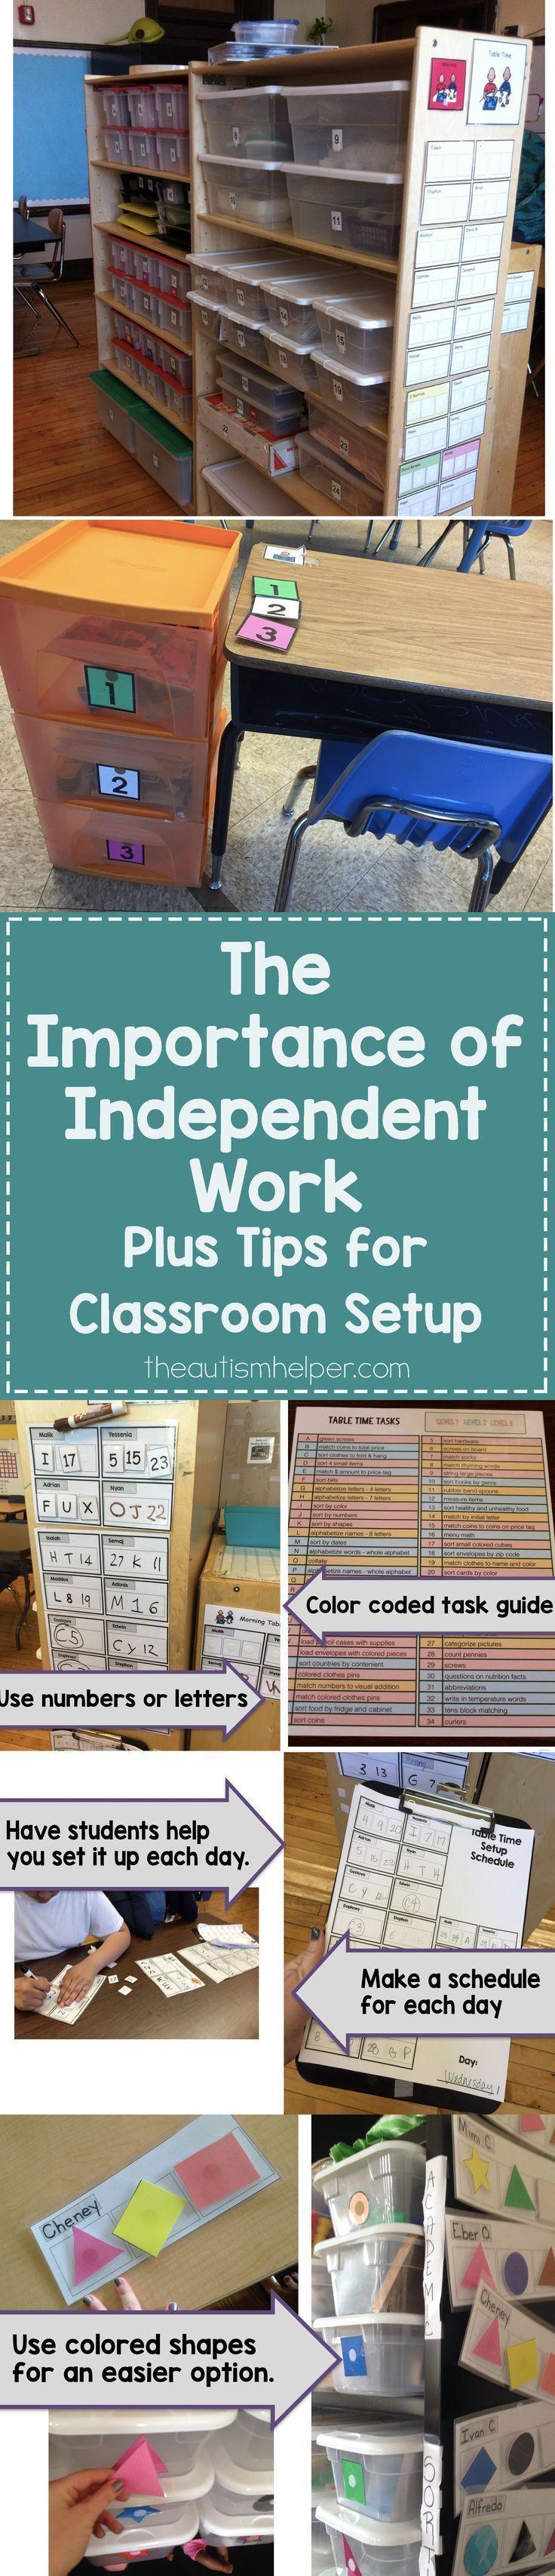 7727 best Teaching images on Pinterest | School social work, 2nd ...